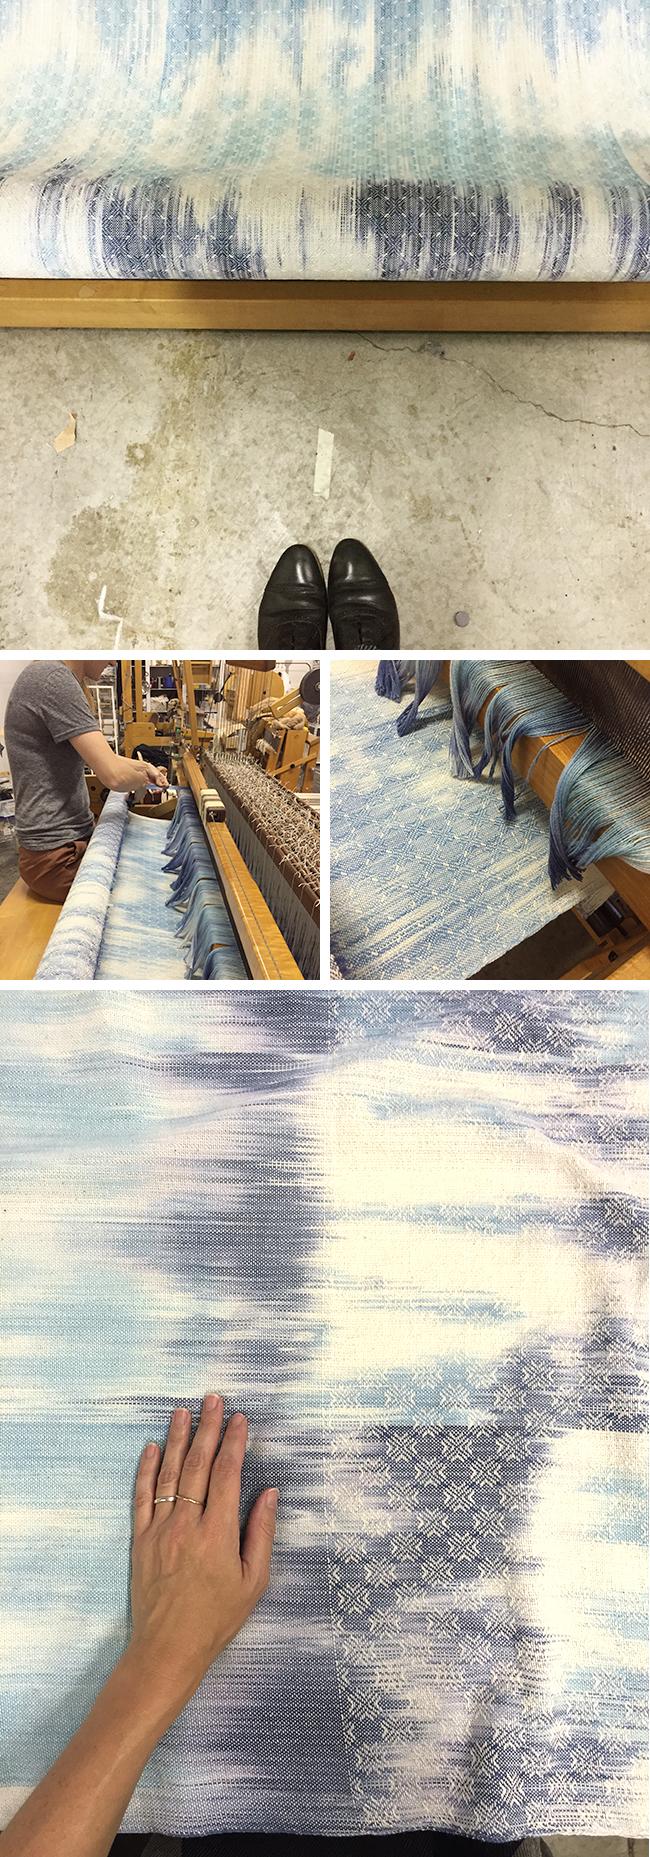 Slotober Frock step 1: Yarn becomes fabric